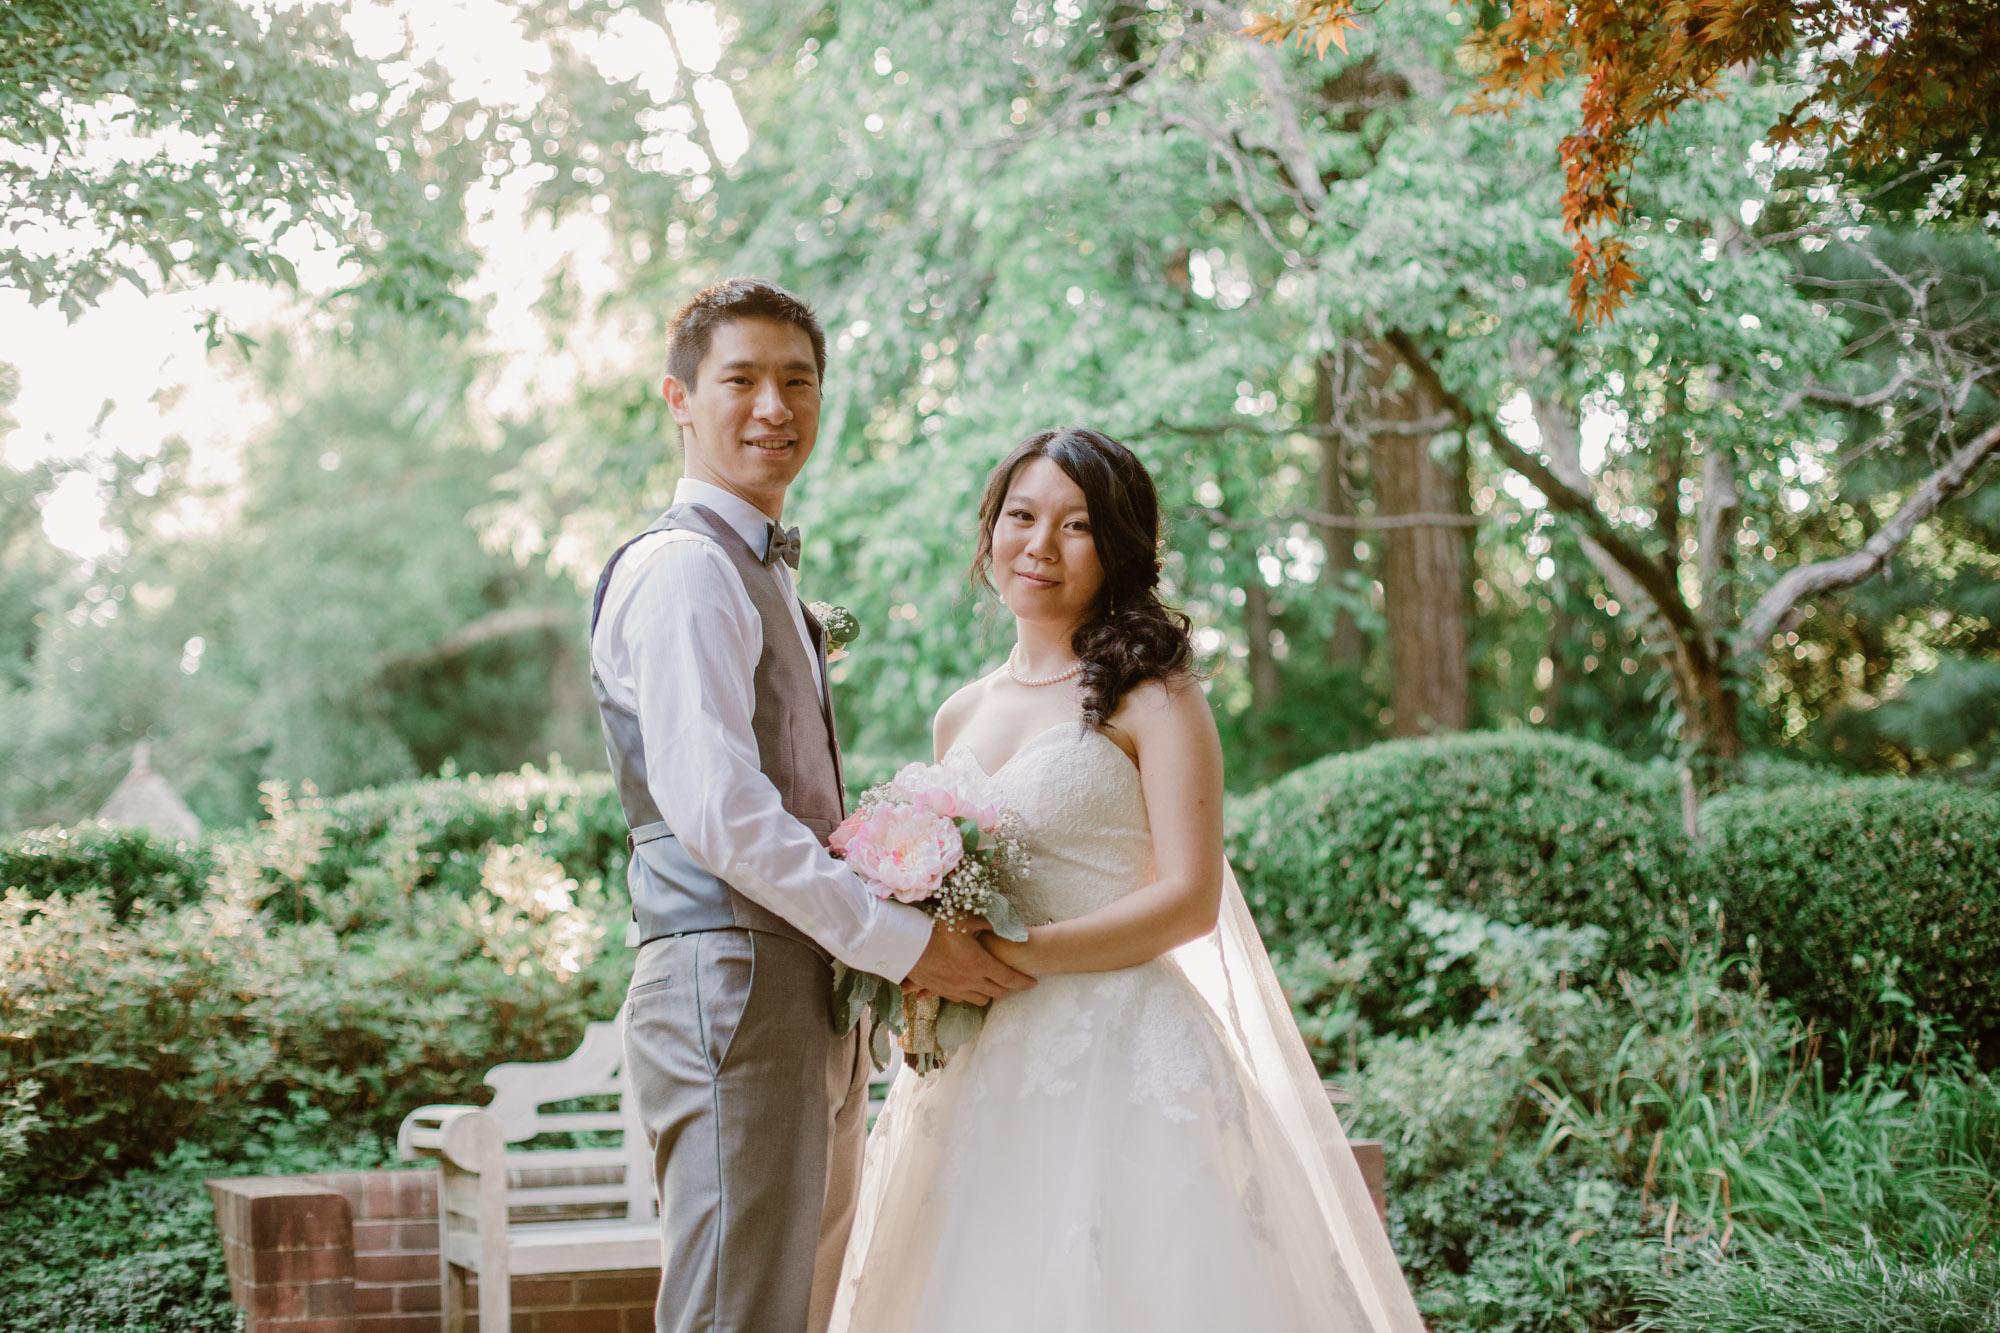 SarahMattozziPhotography-KingsCharter-Wedding-47.jpg